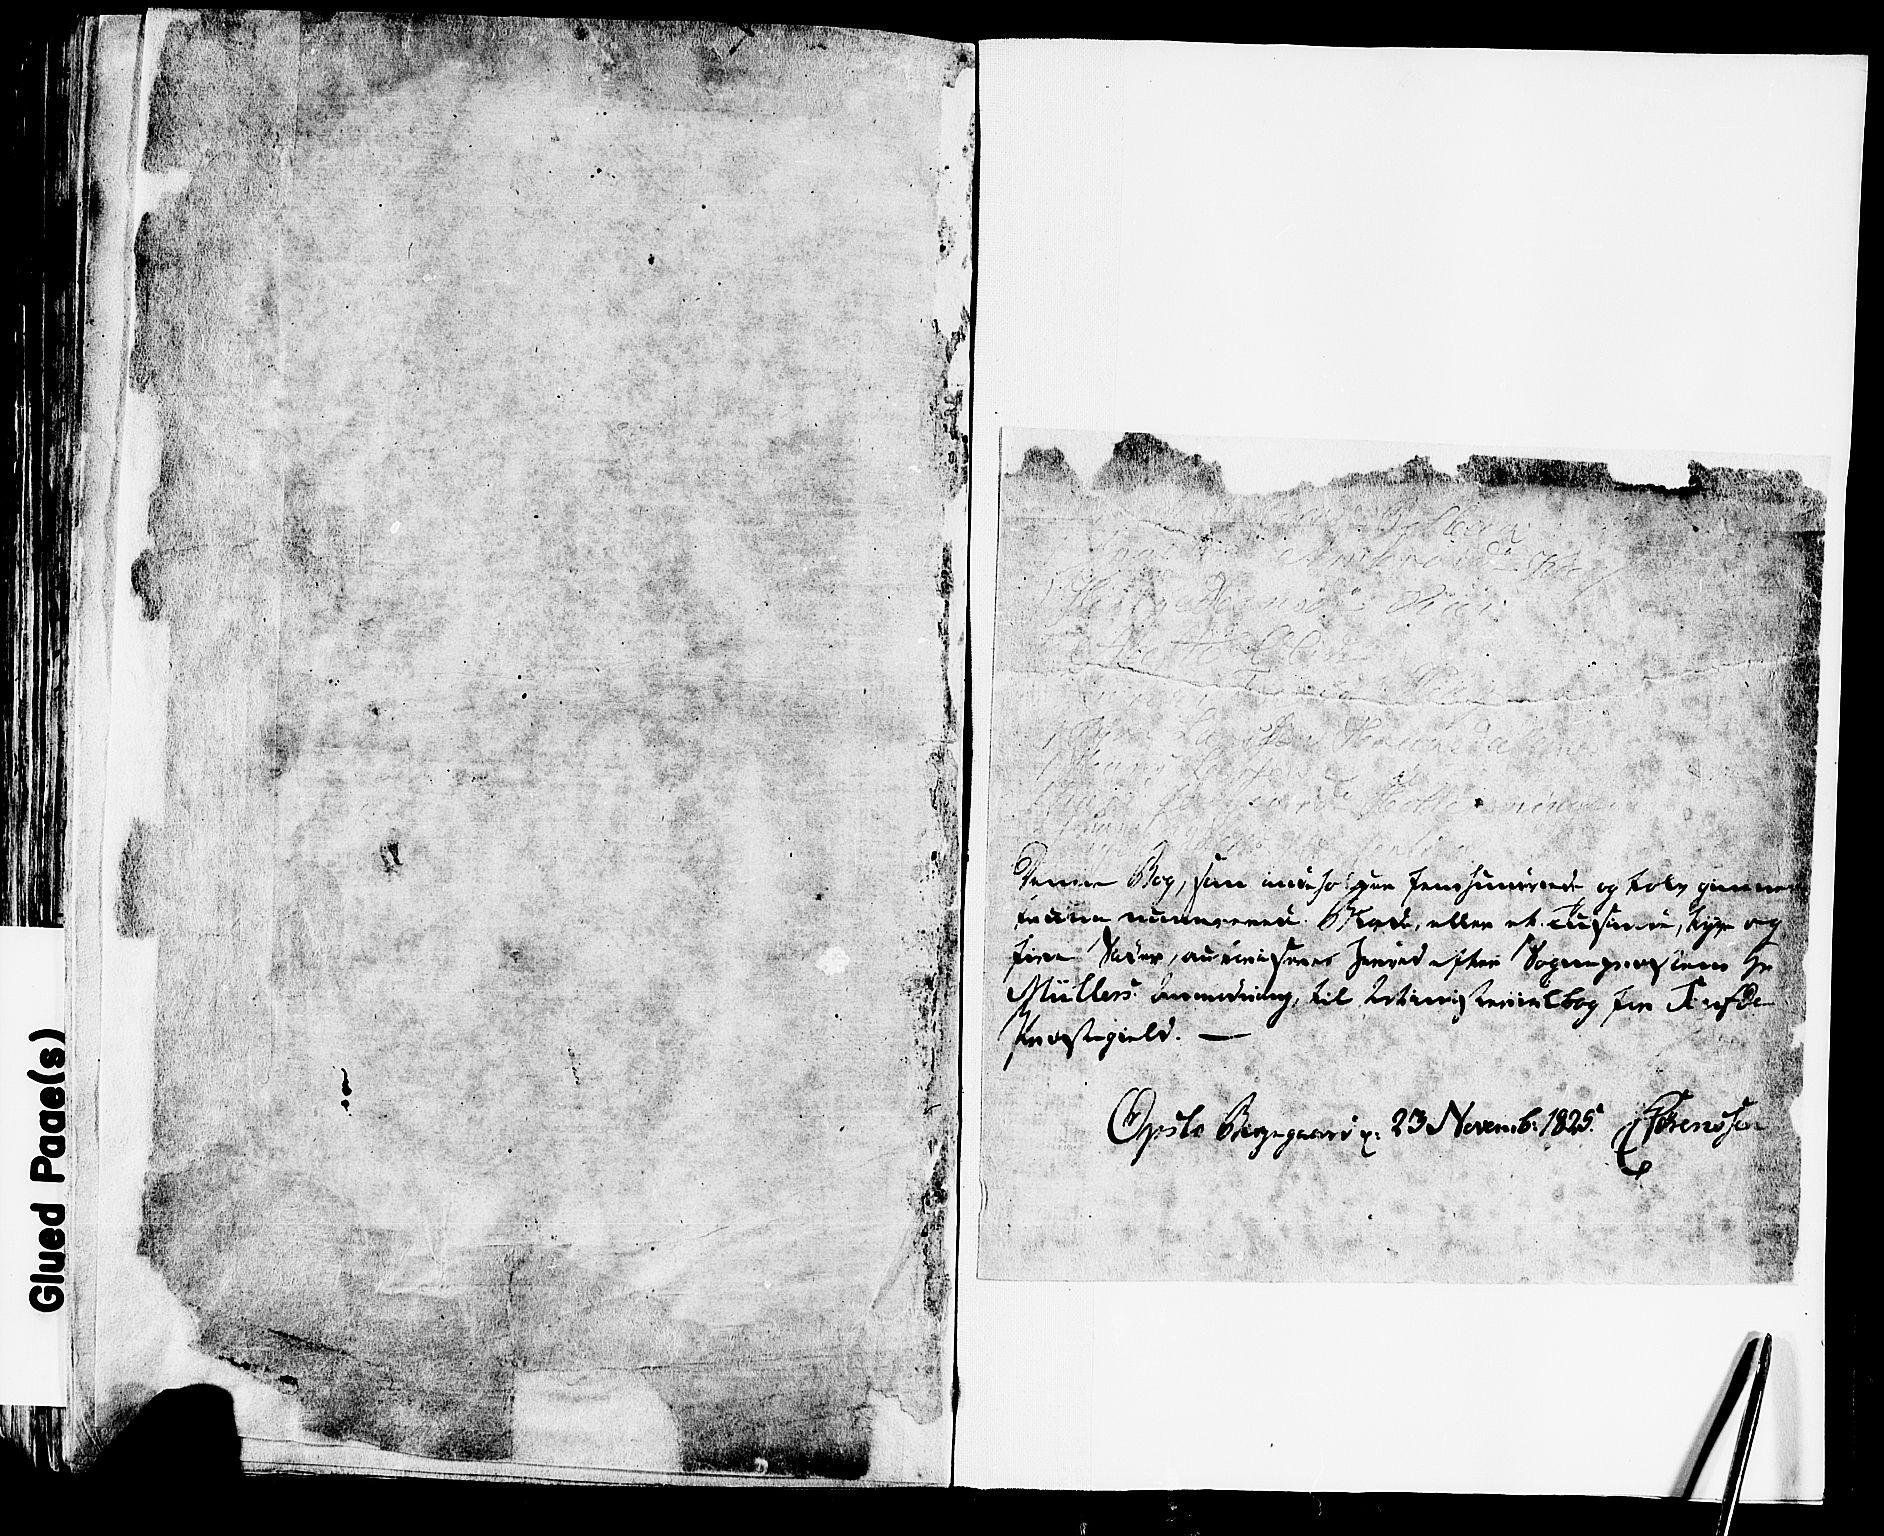 SAKO, Sauherad kirkebøker, F/Fa/L0006: Ministerialbok nr. I 6, 1827-1850